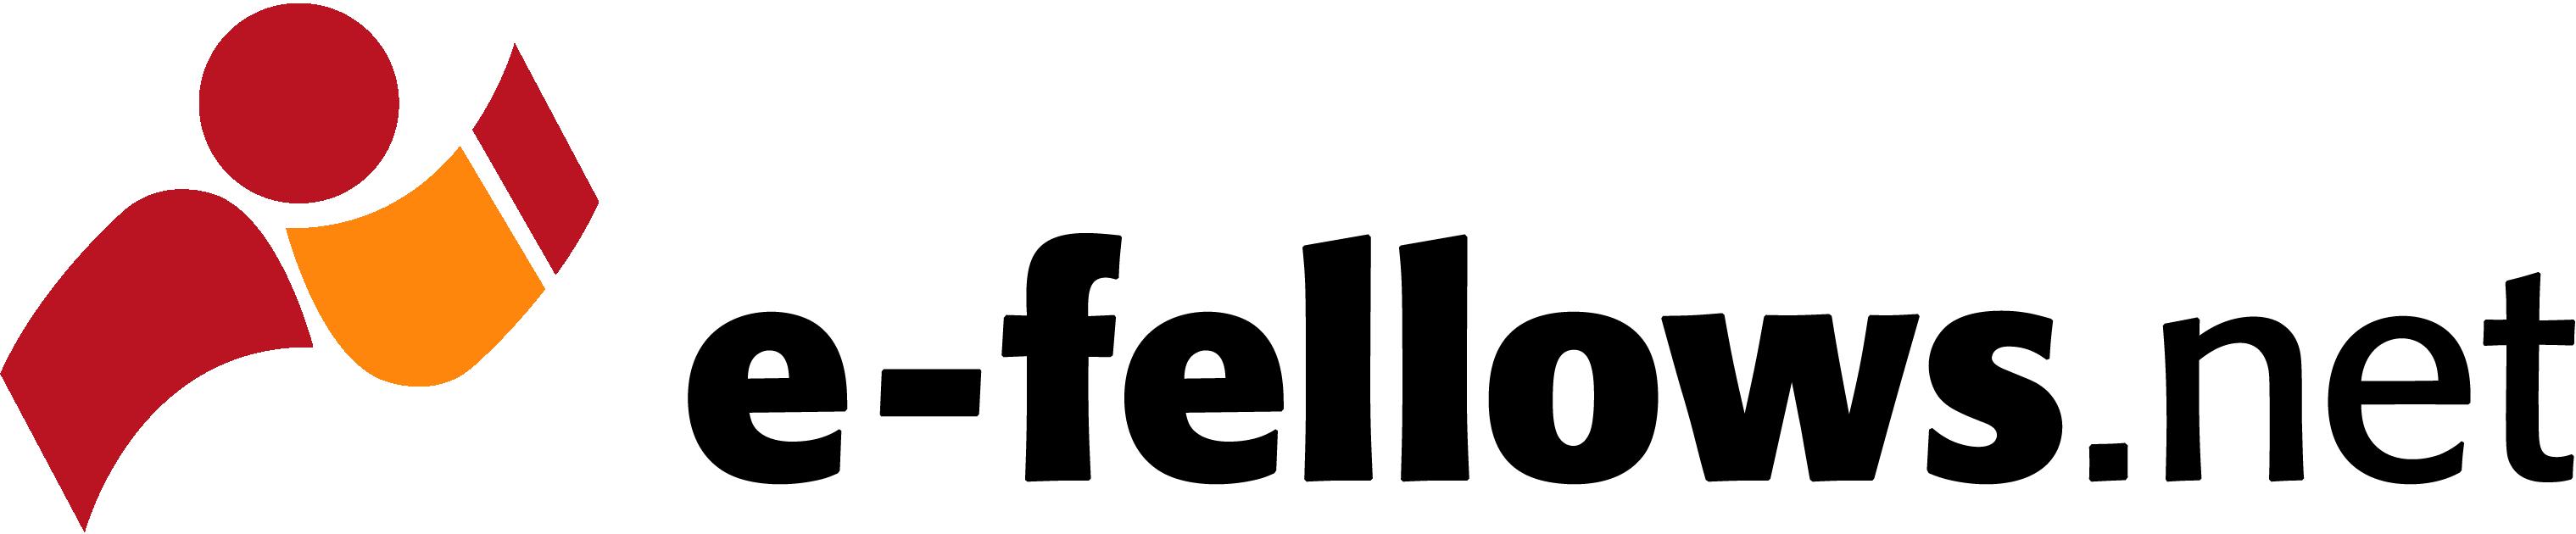 Account, Event und Projekt Manager (m/w/d) - e-fellows.net GmbH & Co. KG - Logo